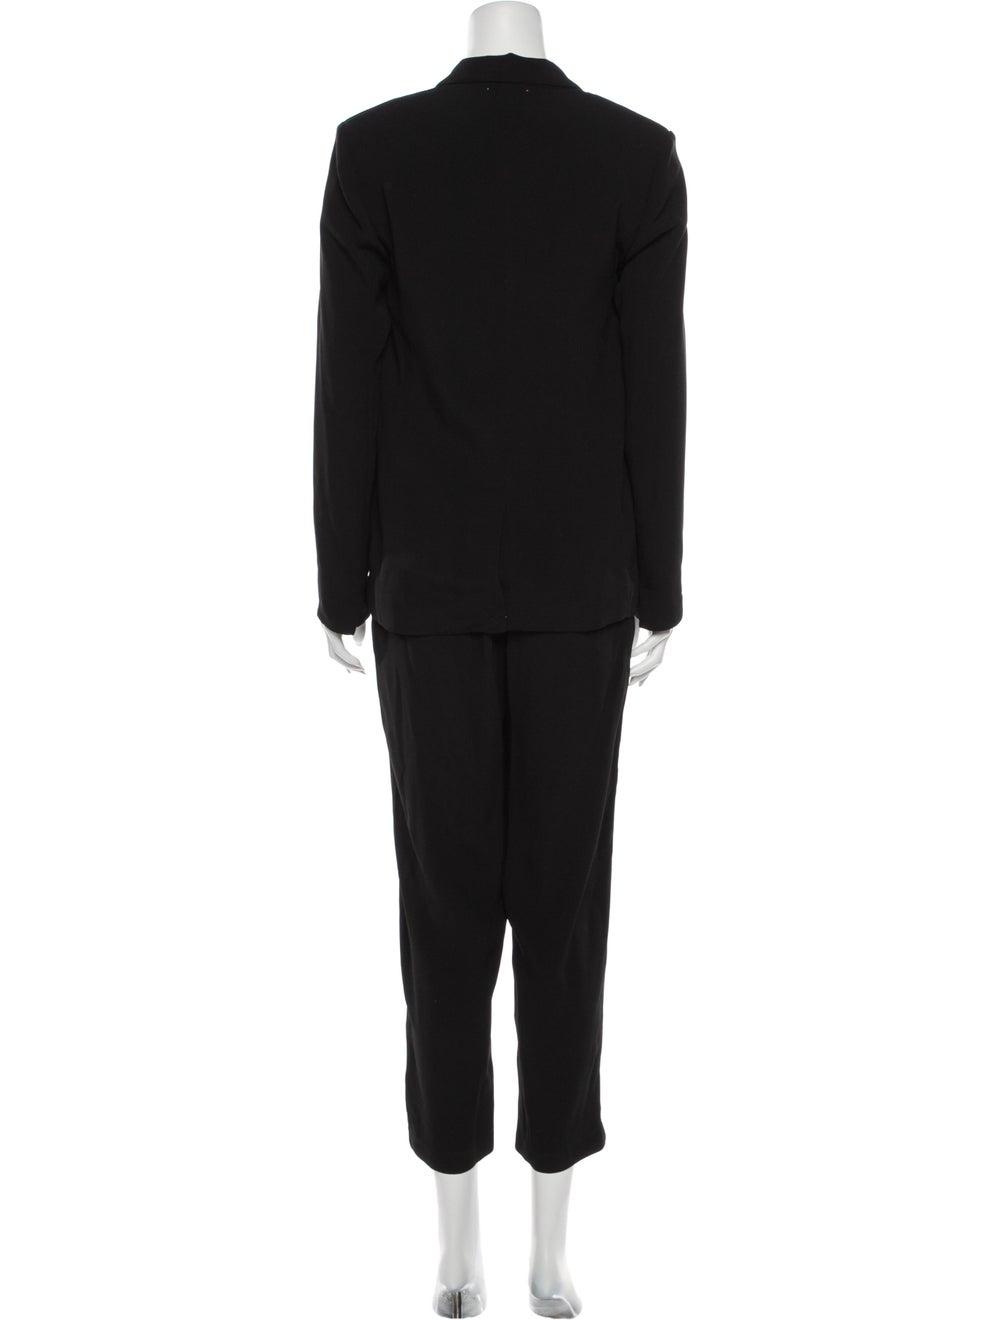 forte_forte Pantsuit Black - image 3